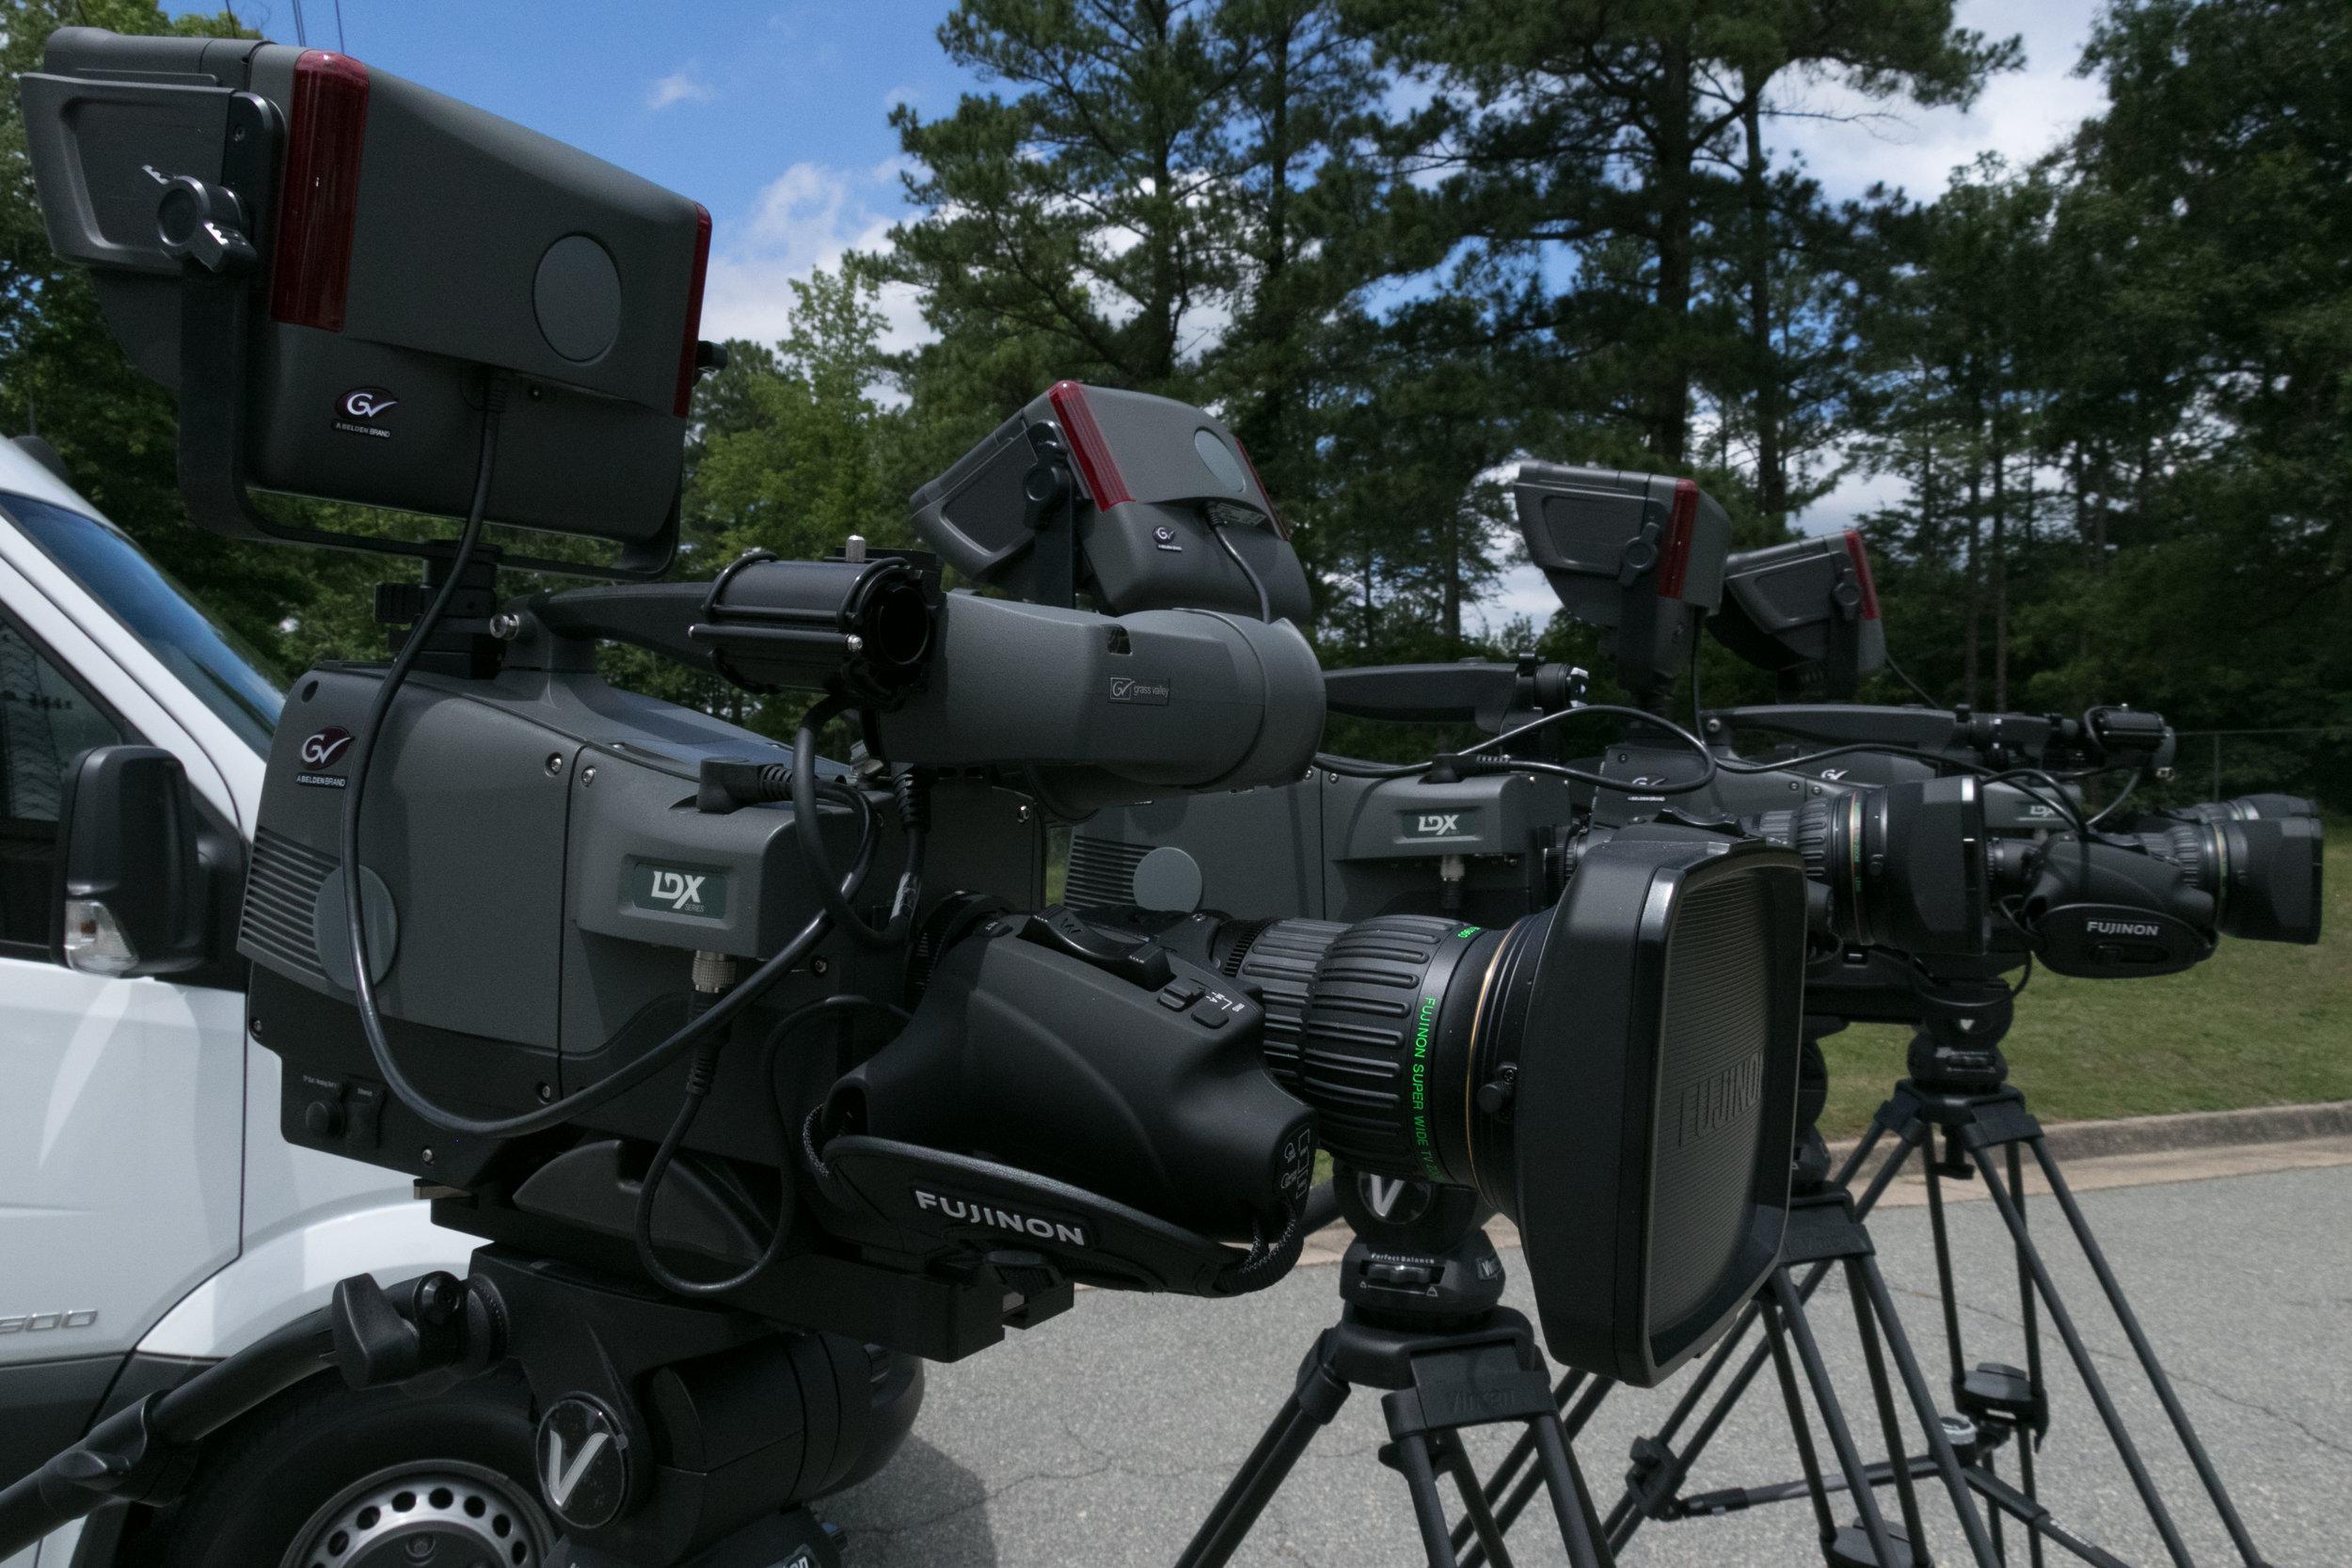 4 Grass Valley Cameras